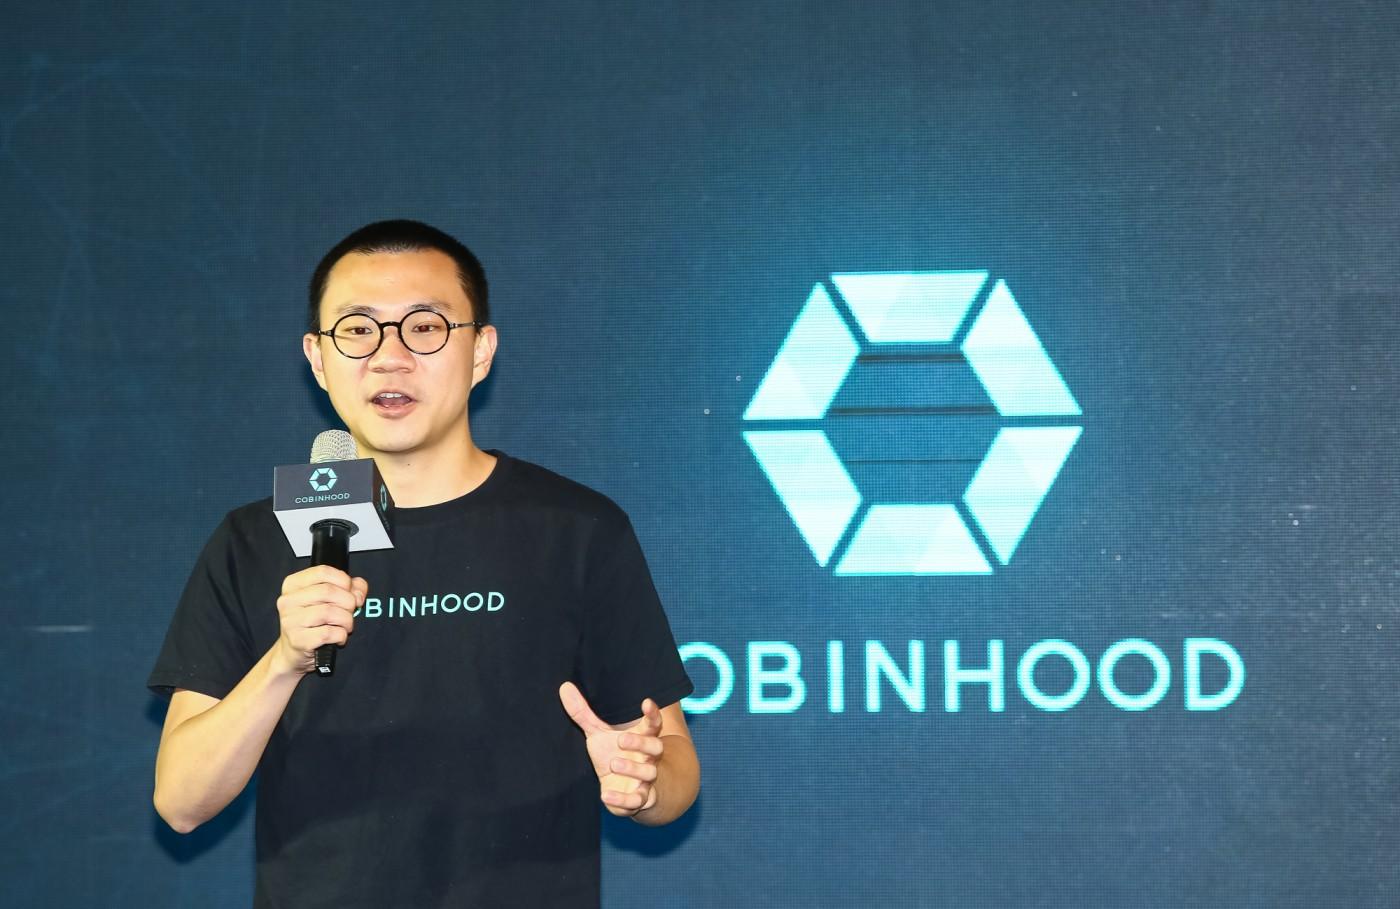 COBINHOOD高層爆內鬨!陳泰元控公司被違法奪取,CTO黃偉寧提告護員工